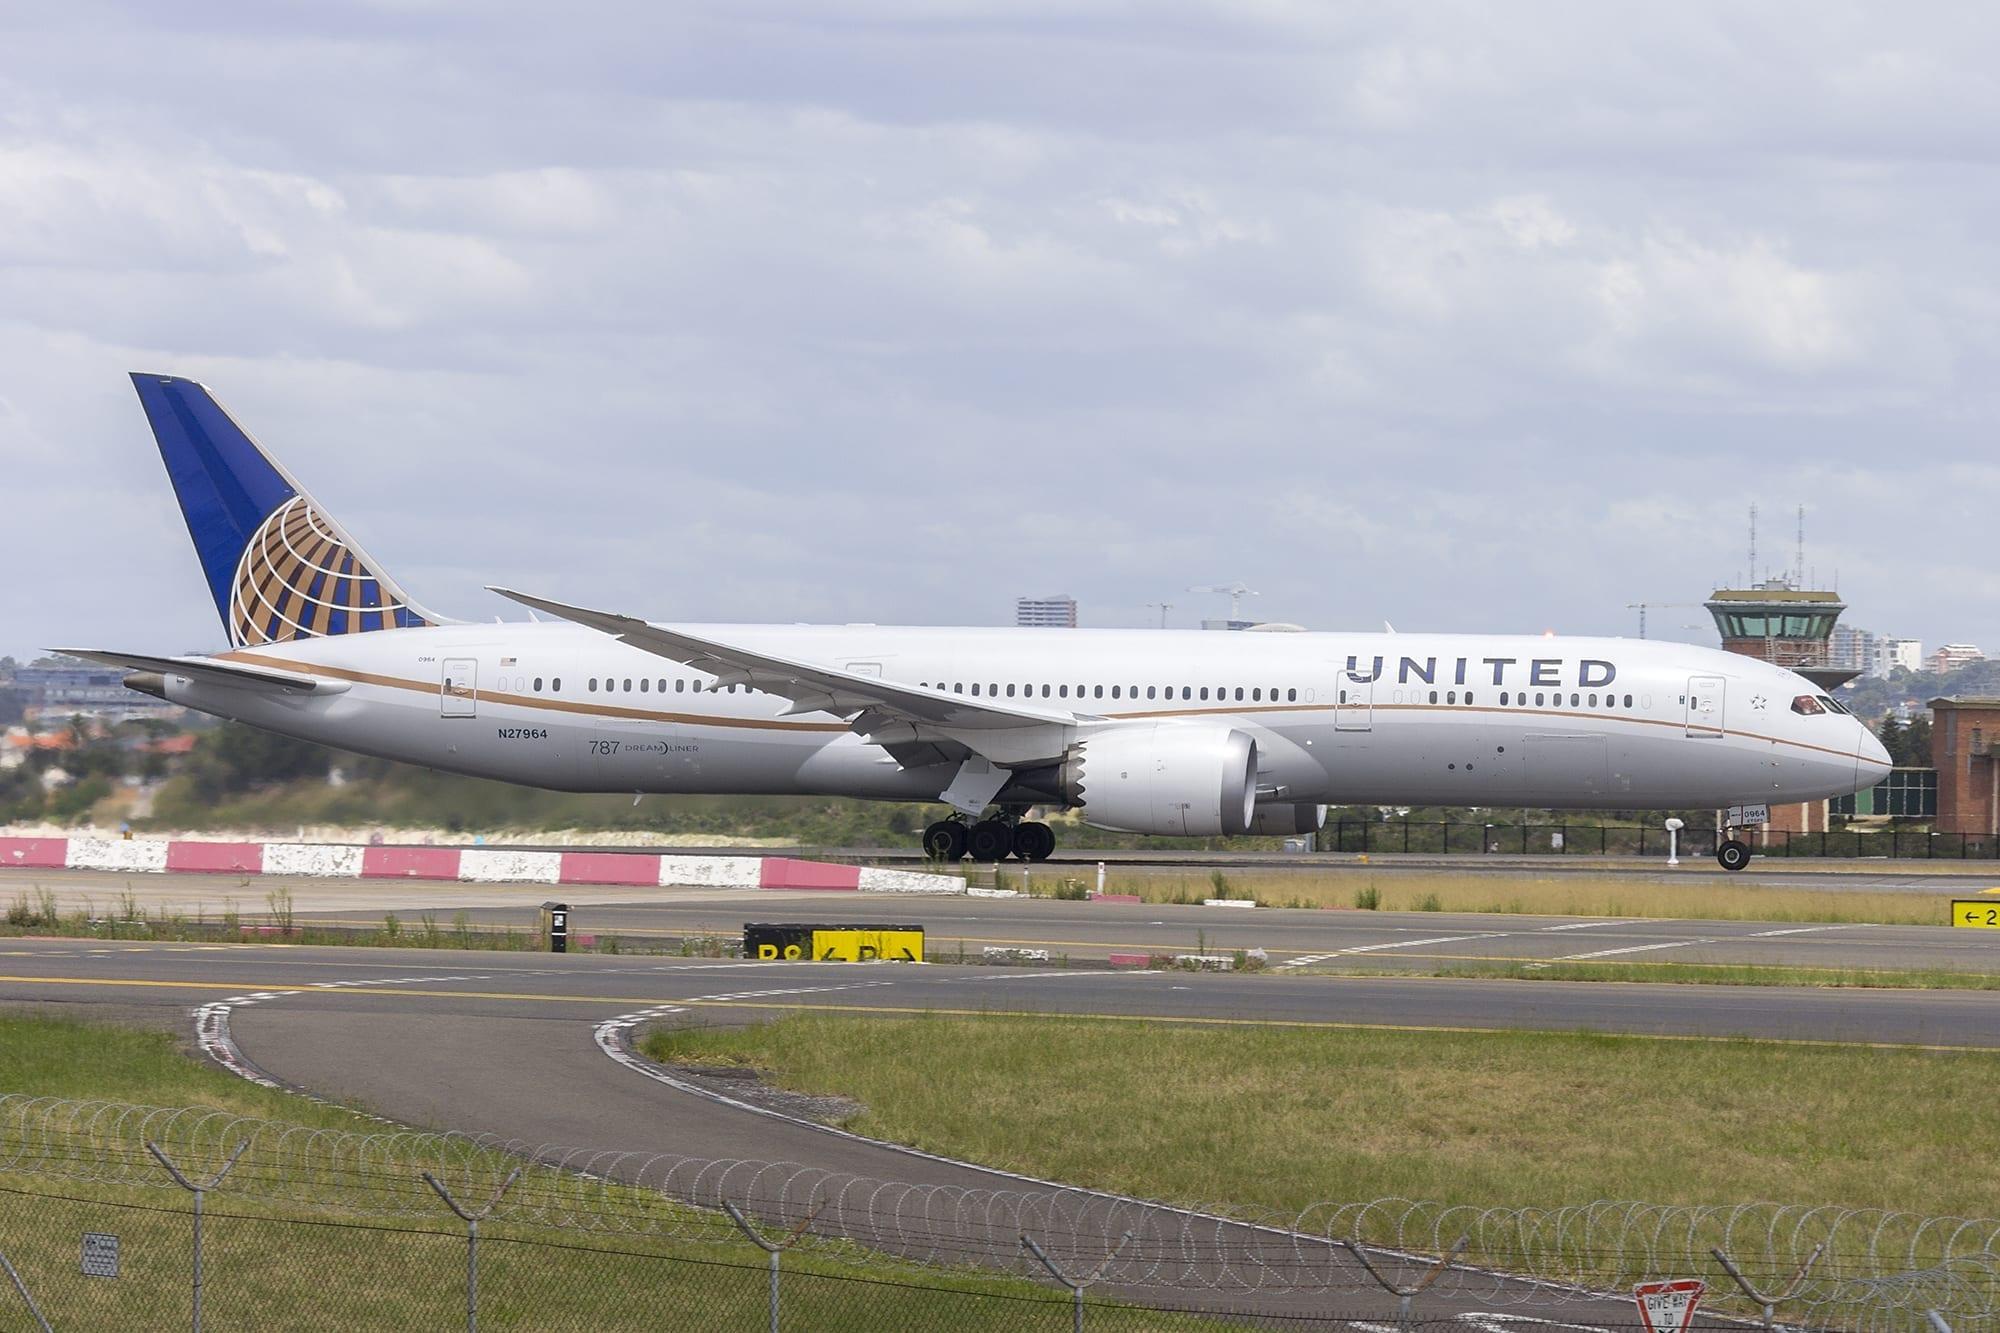 United Airlines(N27964)Boeing 787-9 DreamlinerdepartingSydney Airport; image by Bidgee, CC BY-SA 3.0 AU, via Wikimedia Commons, no changes.